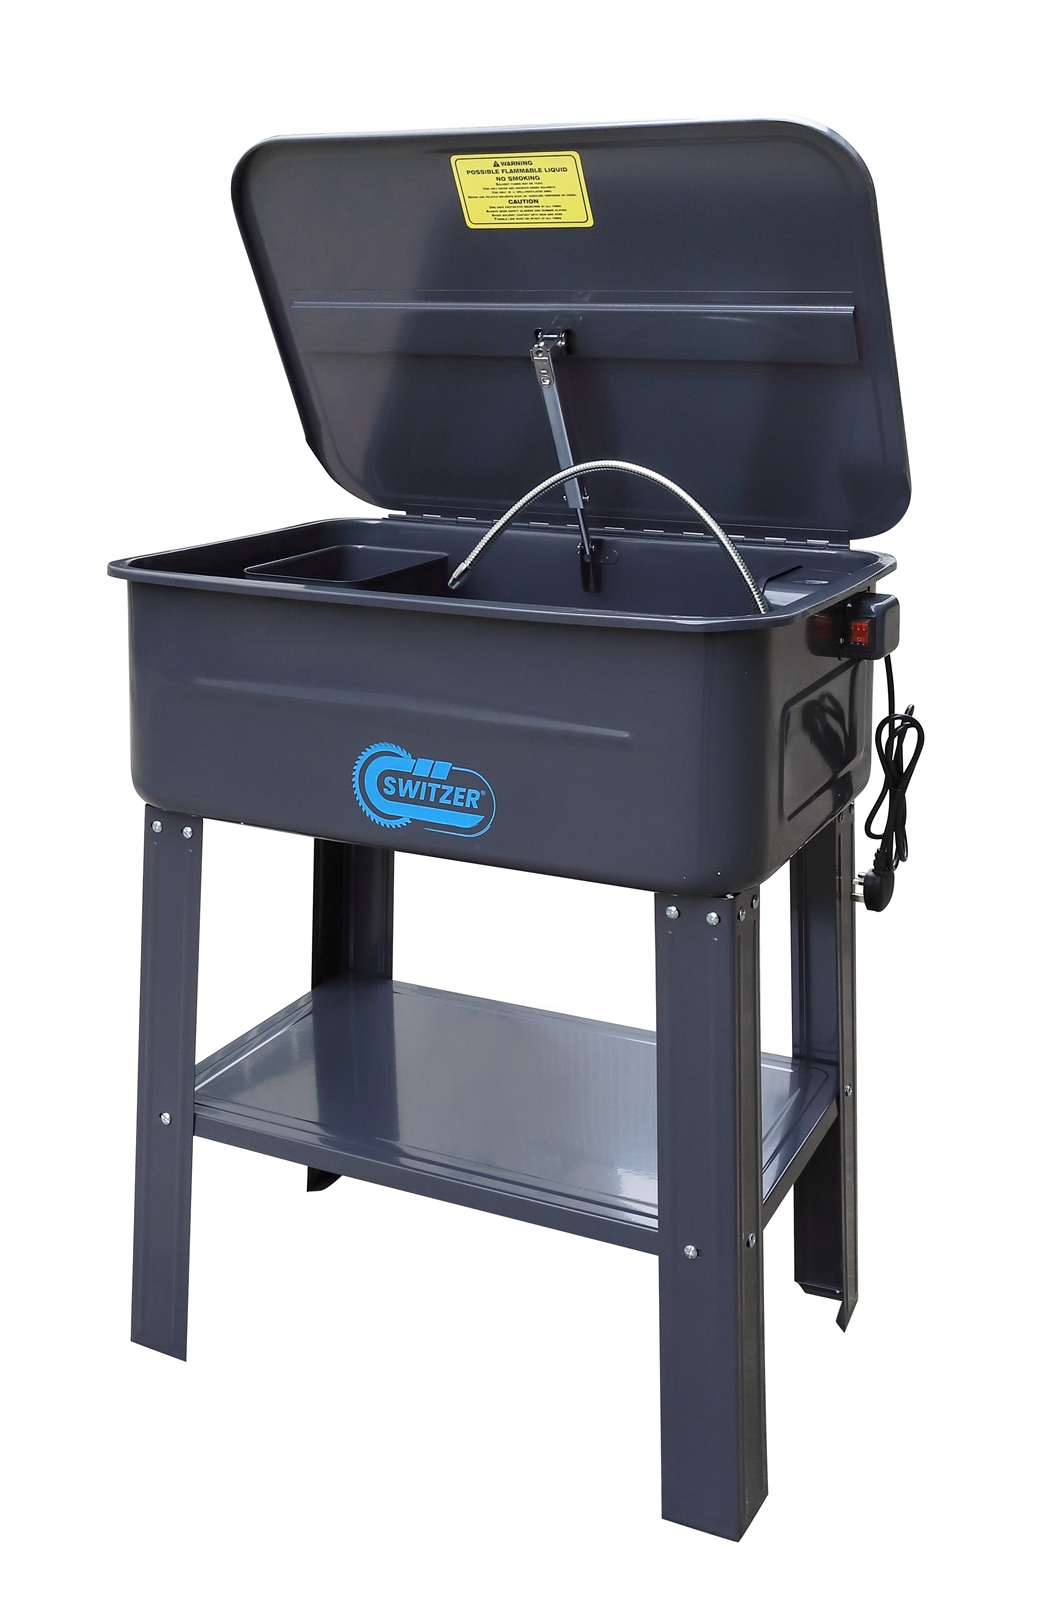 Switzer Part Washer Degreaser 20 Gallon Solvent Cleaner